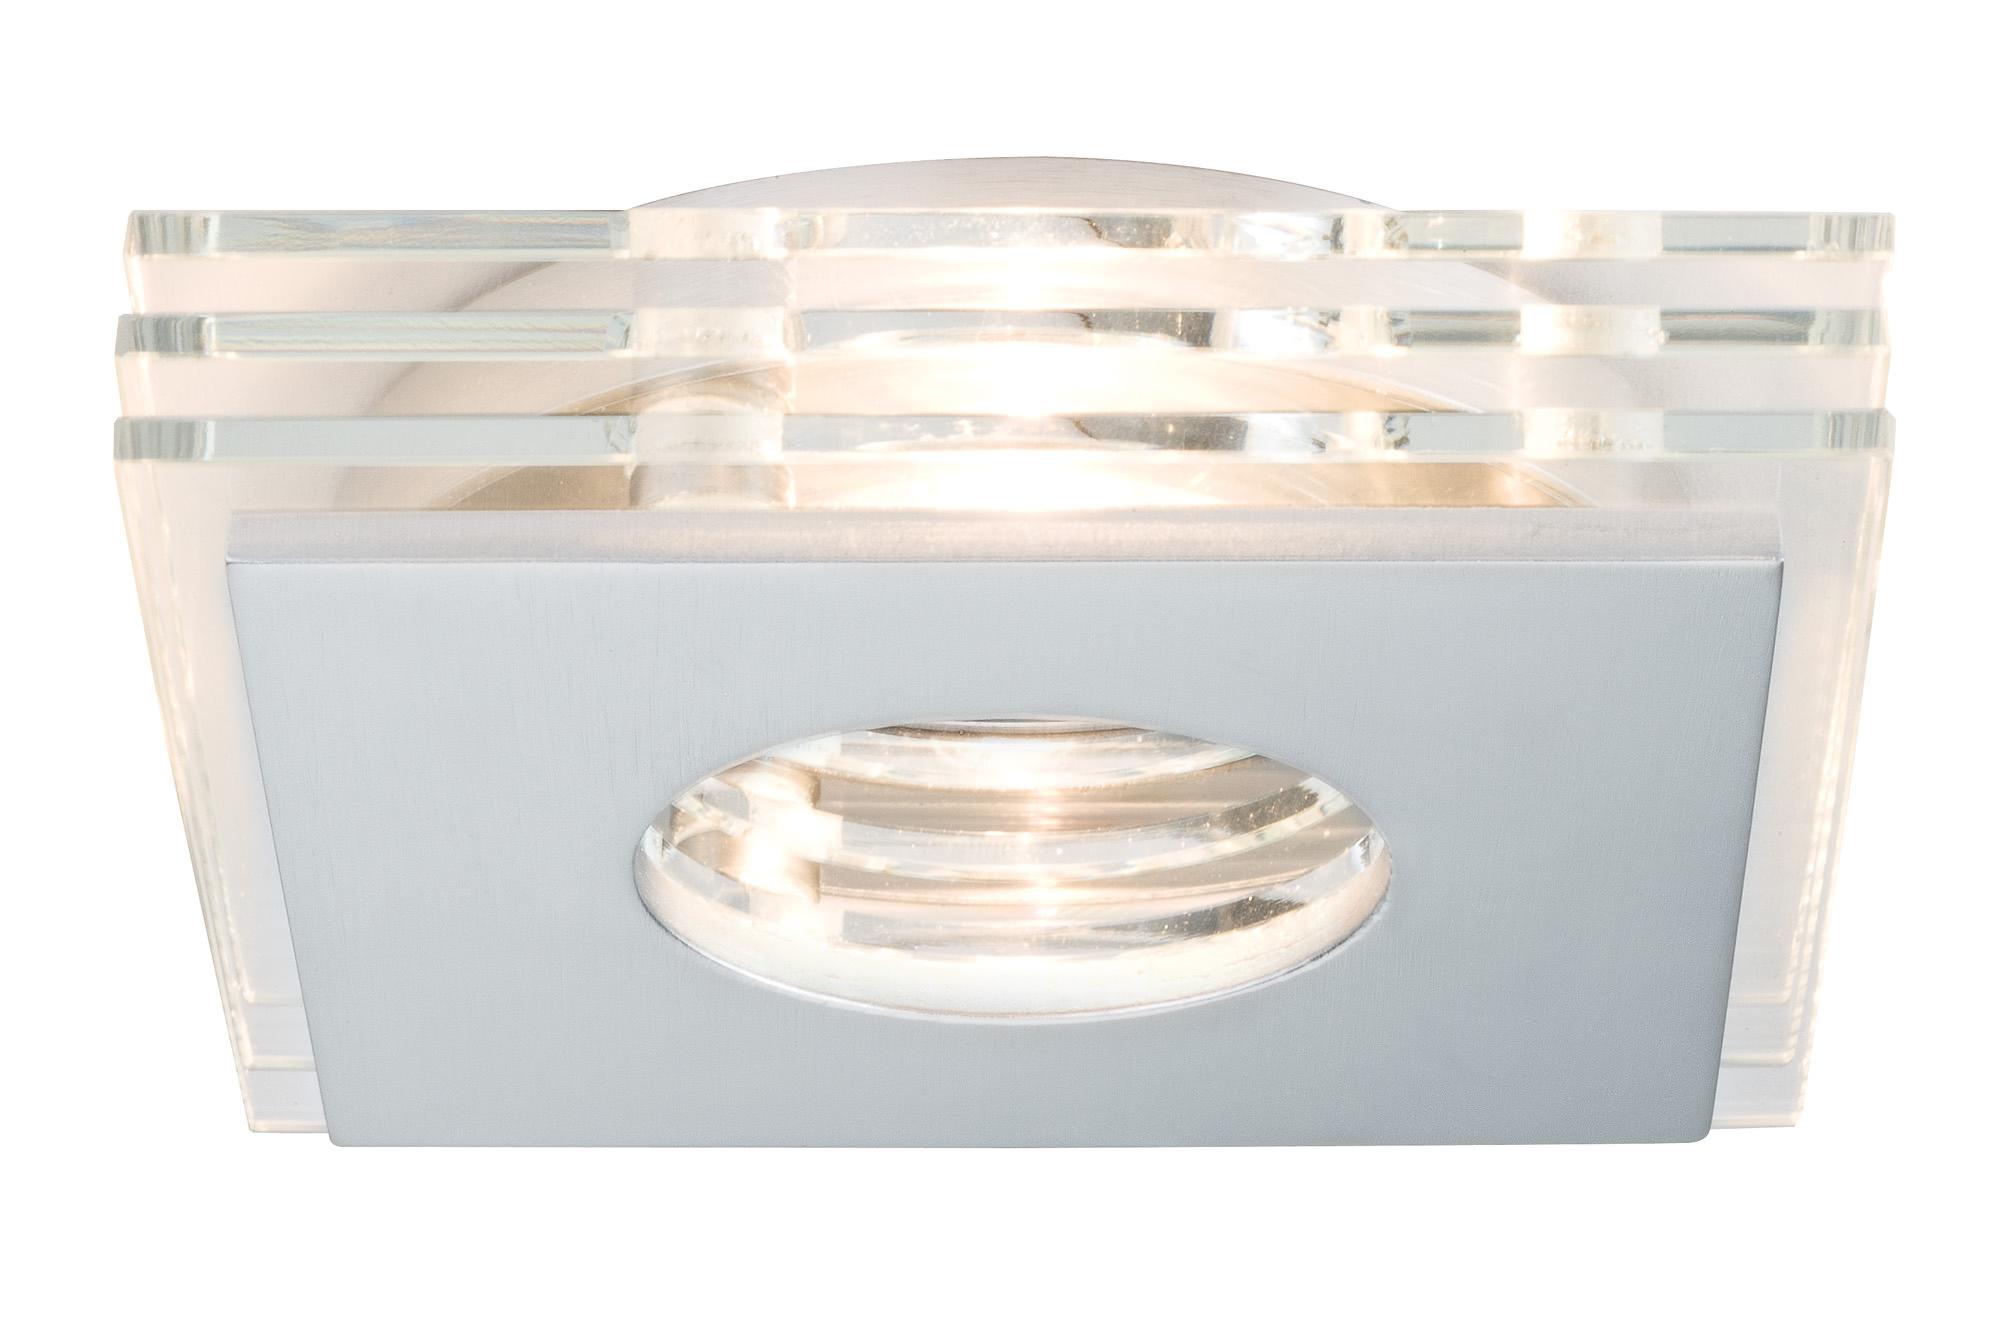 Paulmann. 92723 Светильник встр. Layer LED 3x3,5W GU10 Al-g